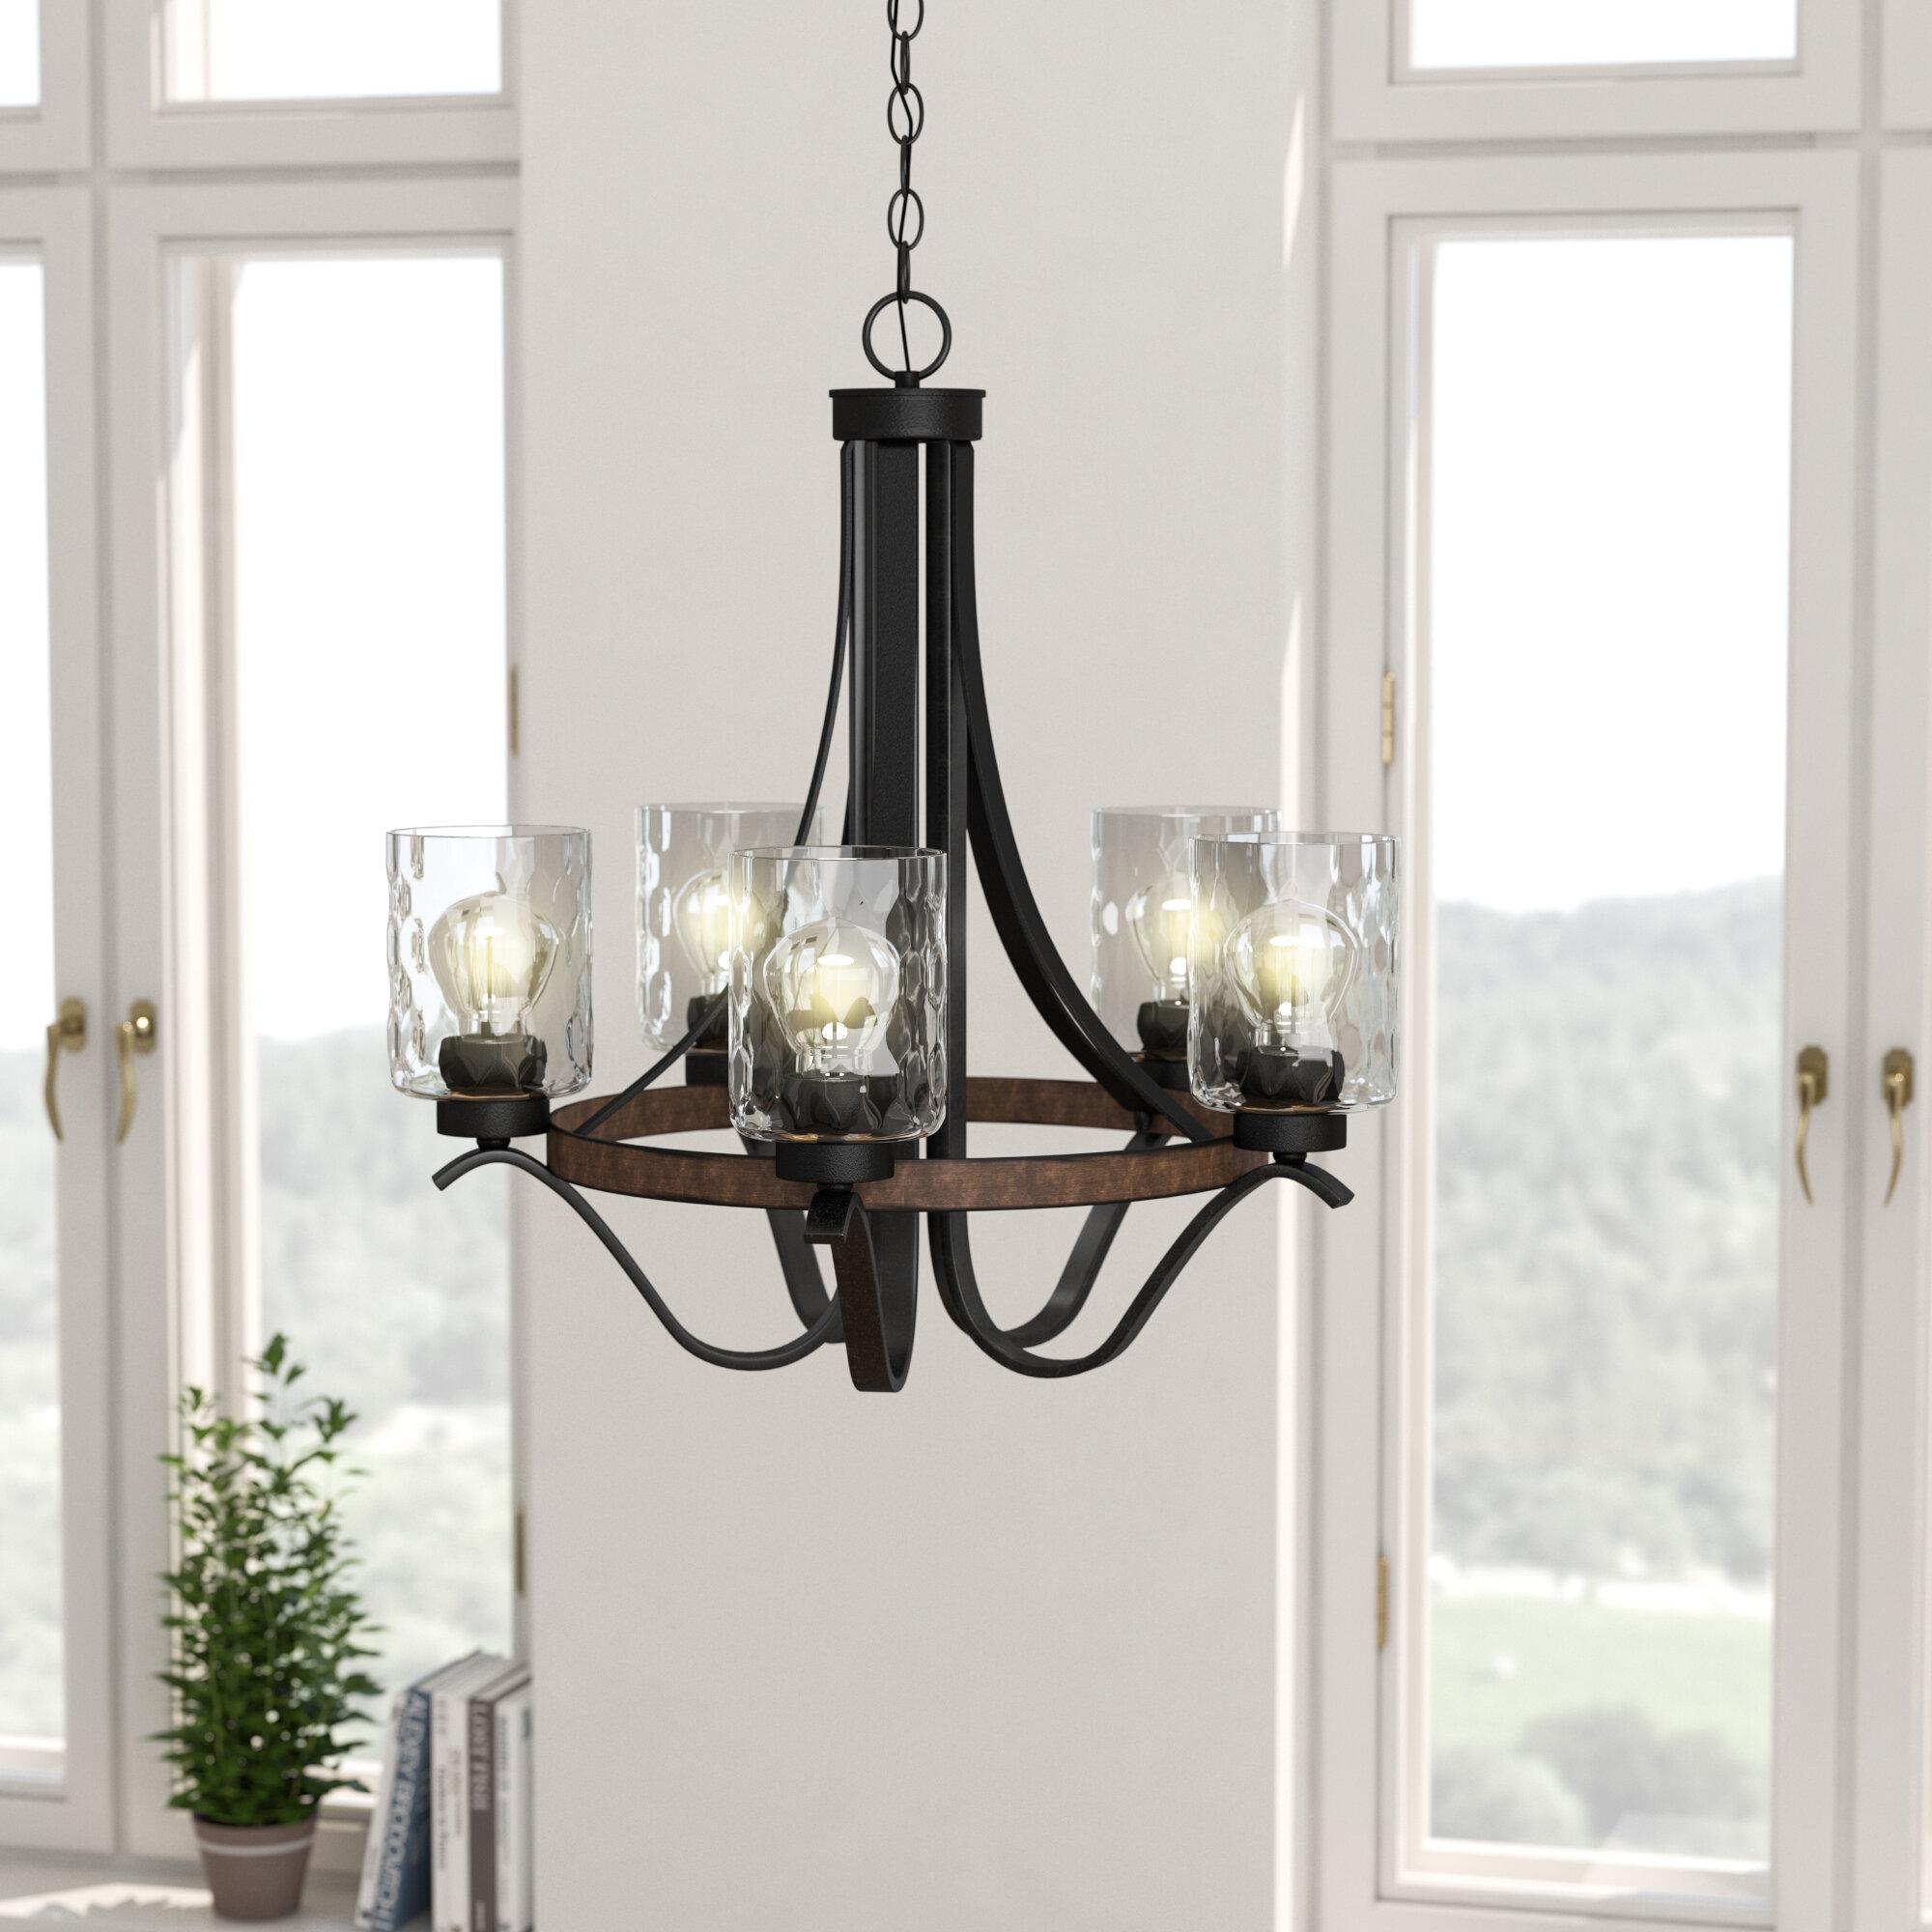 Laurel foundry modern farmhouse sabo indoor 5 light shaded chandelier reviews wayfair